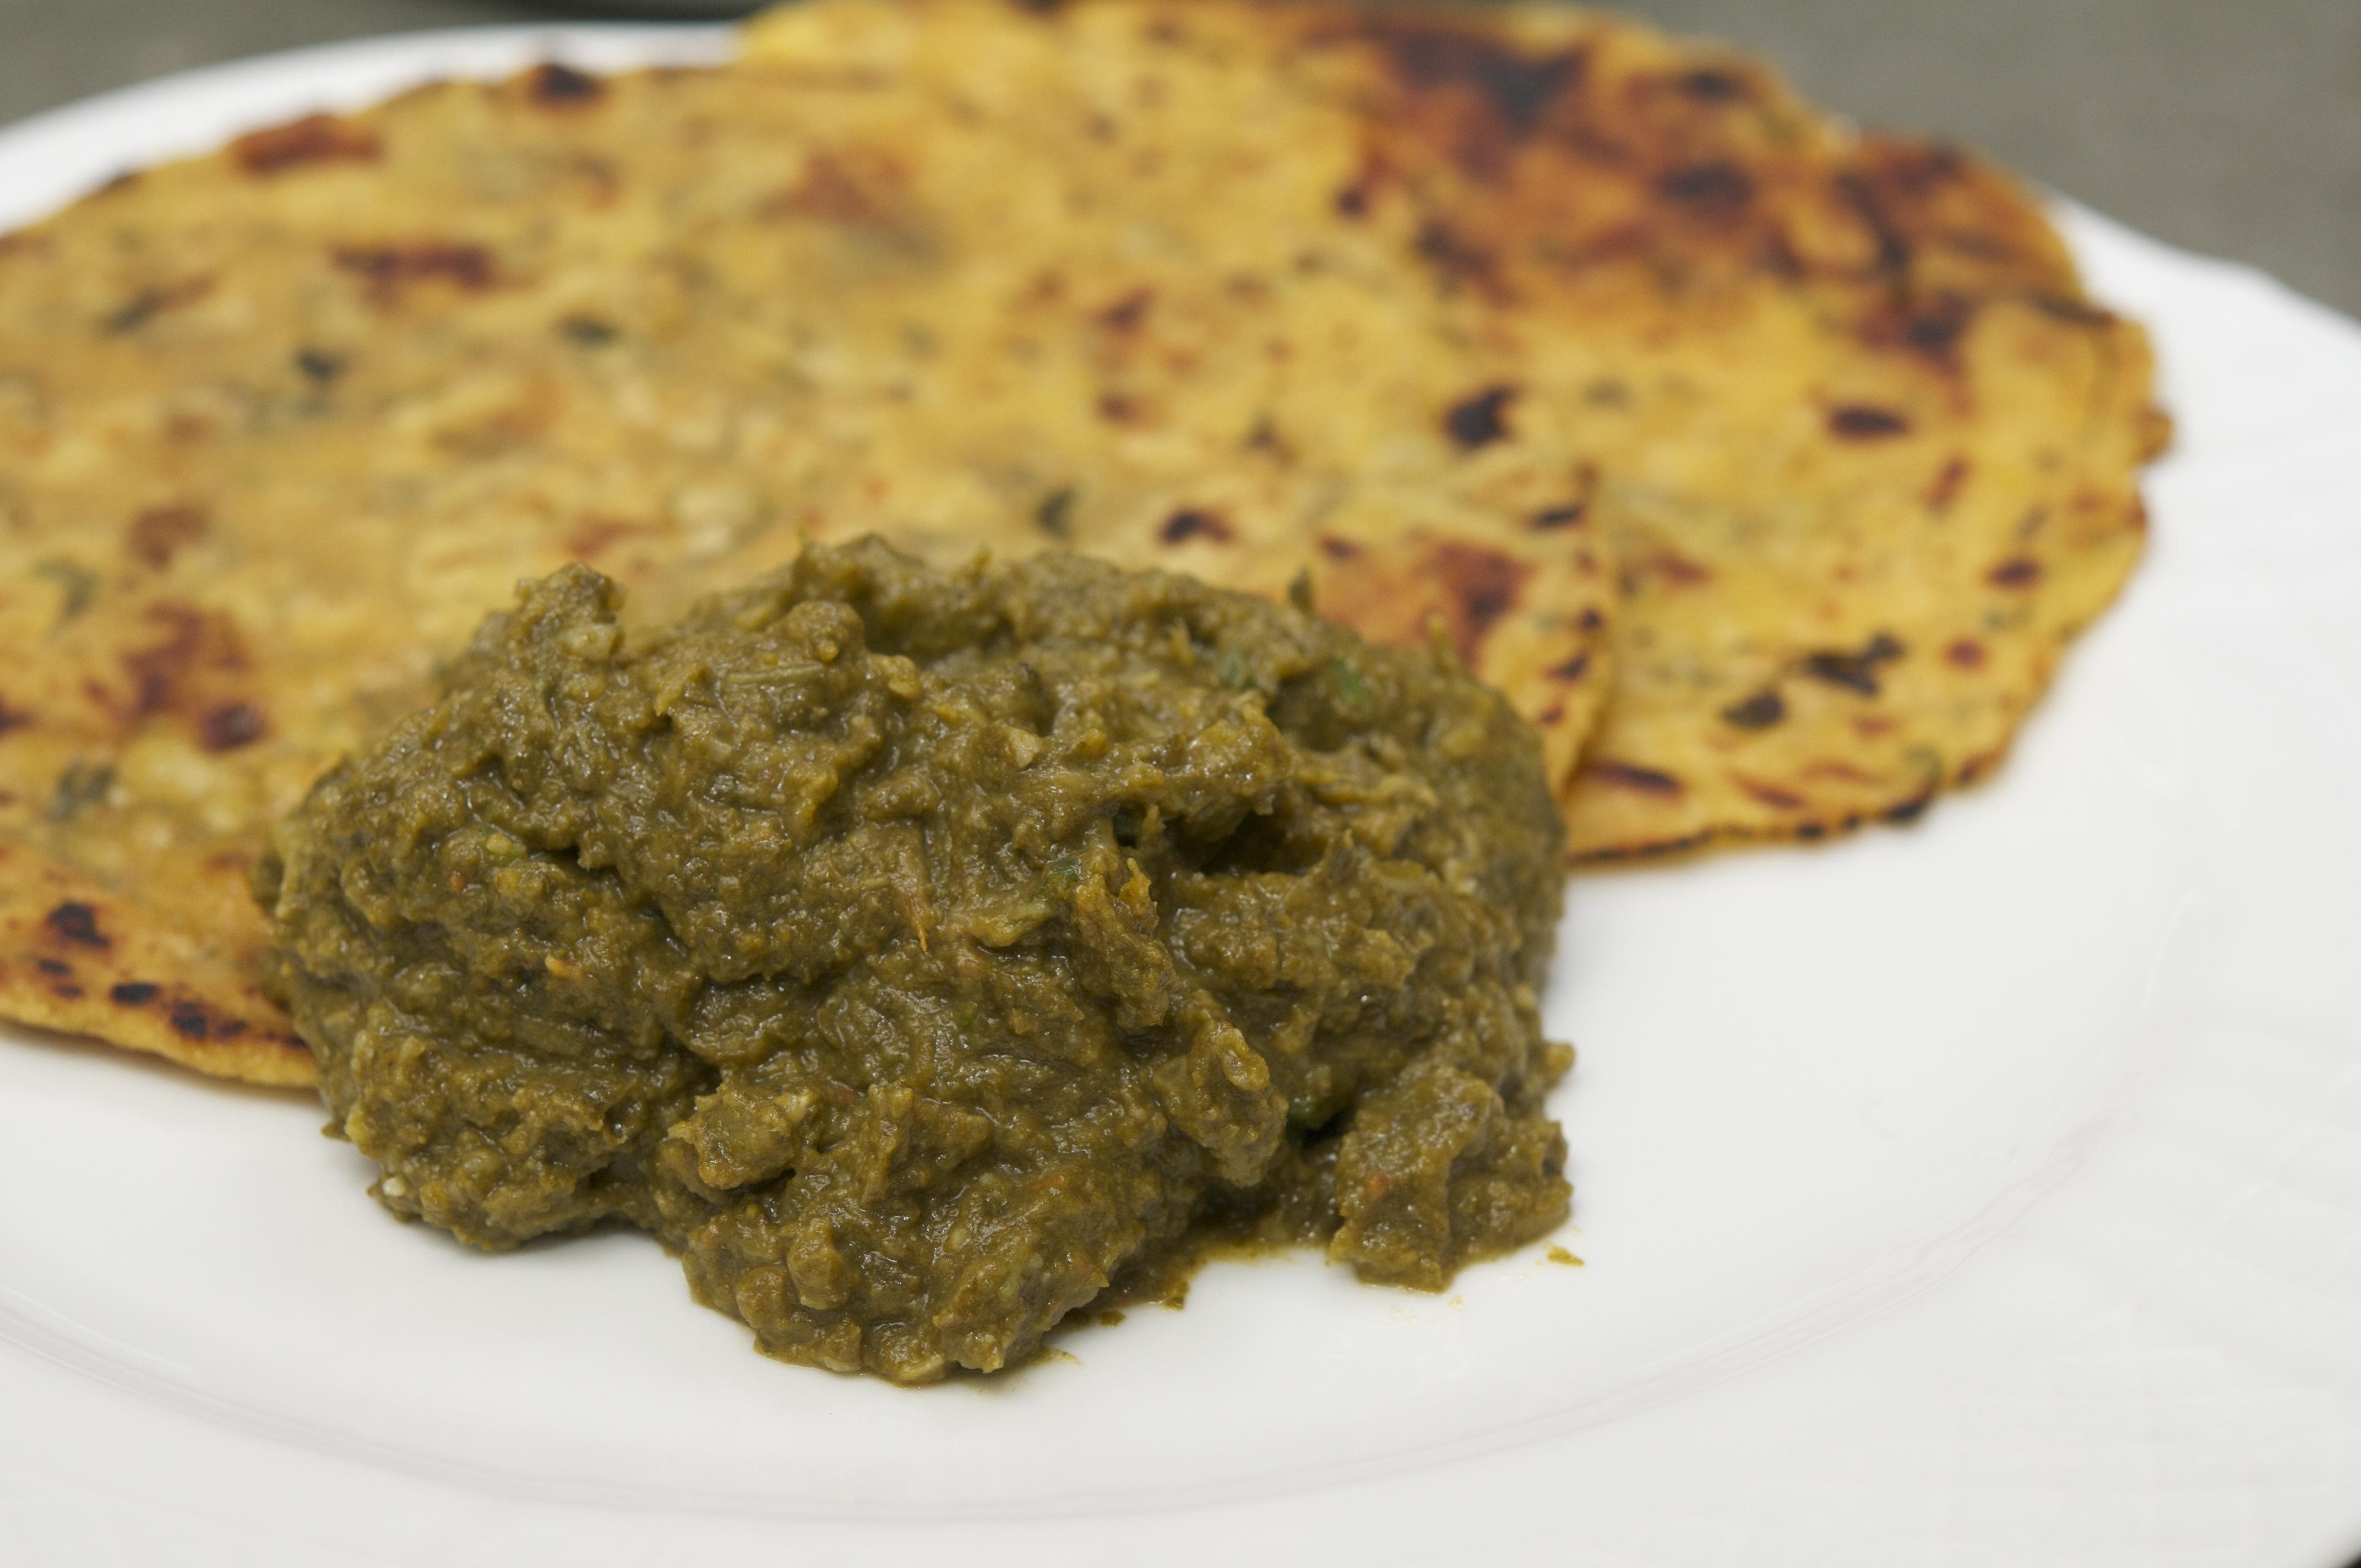 Spinach with mustard greens sarson ka saag the restaurant spinach with mustard greens sarson ka saag forumfinder Gallery